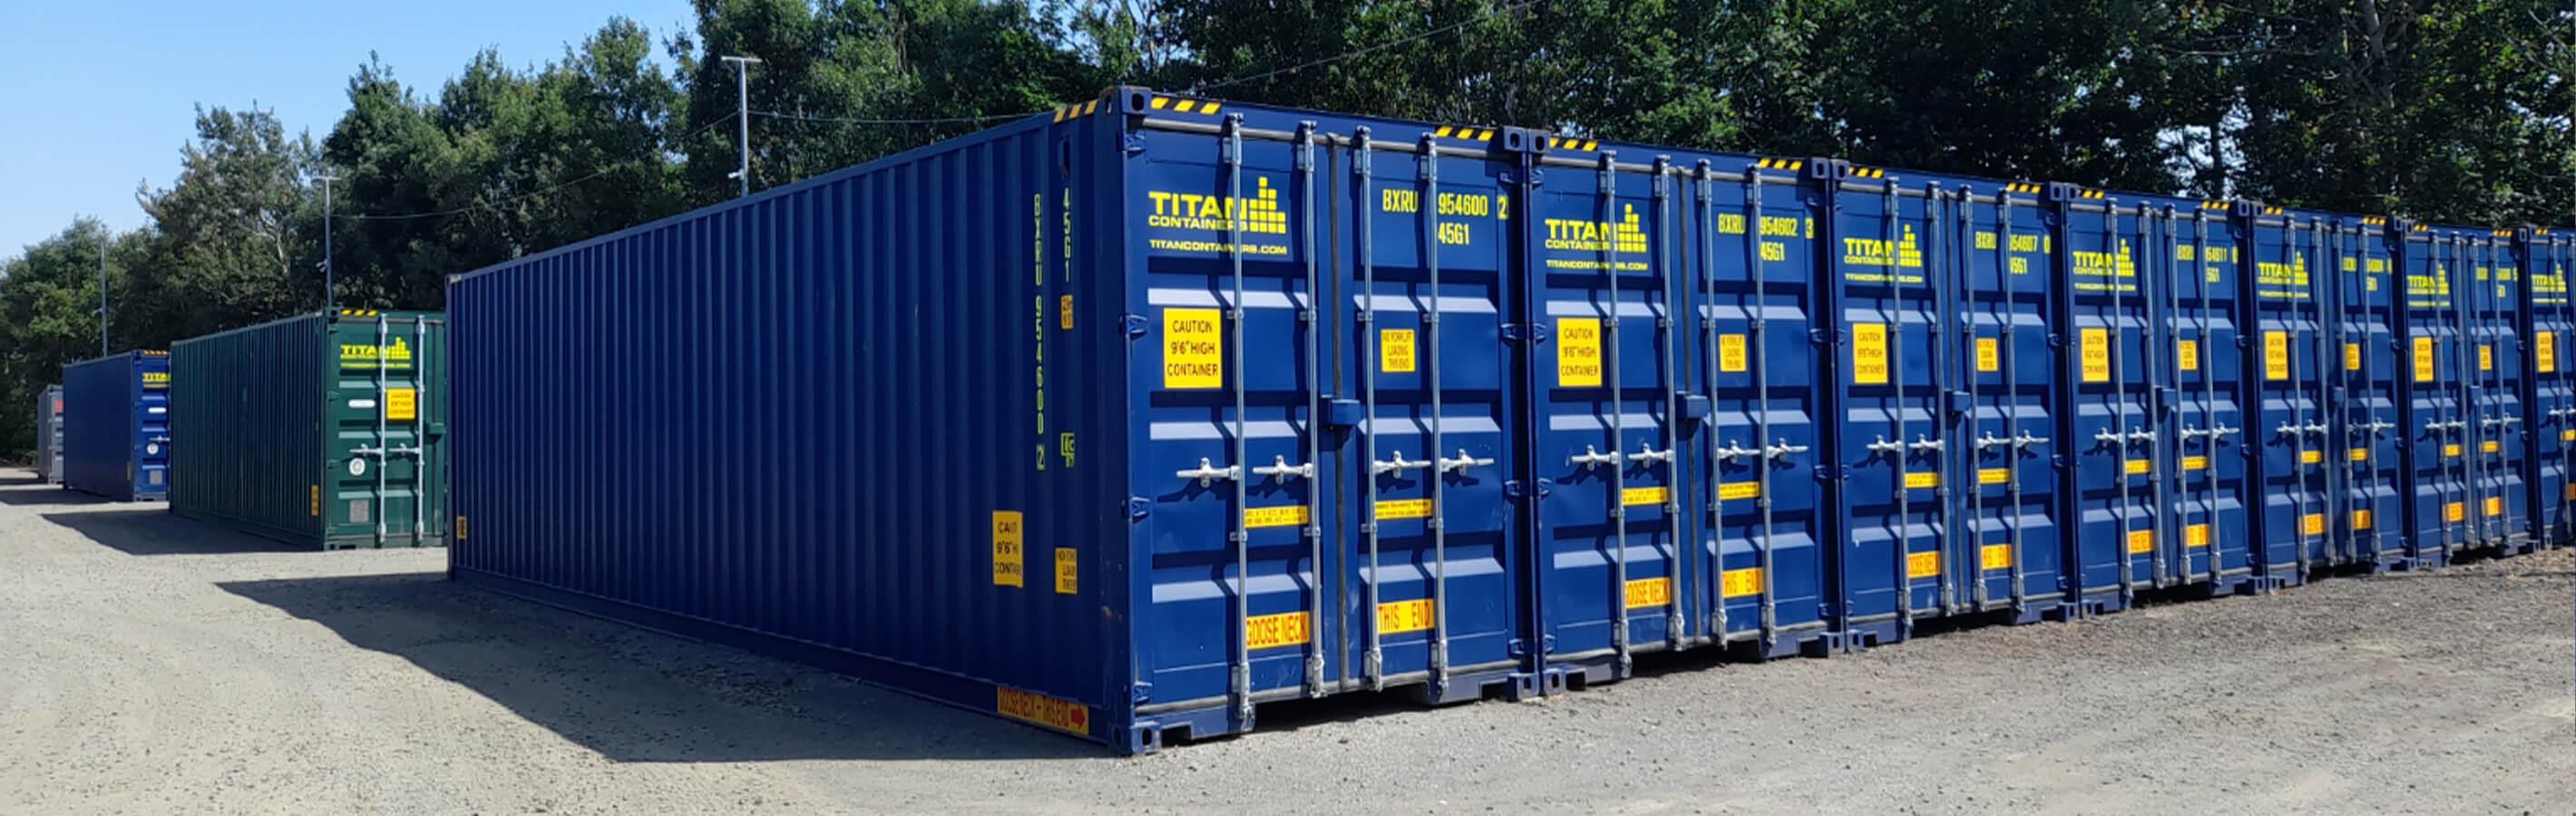 Glasgow Self Storage header image | TITAN Containers